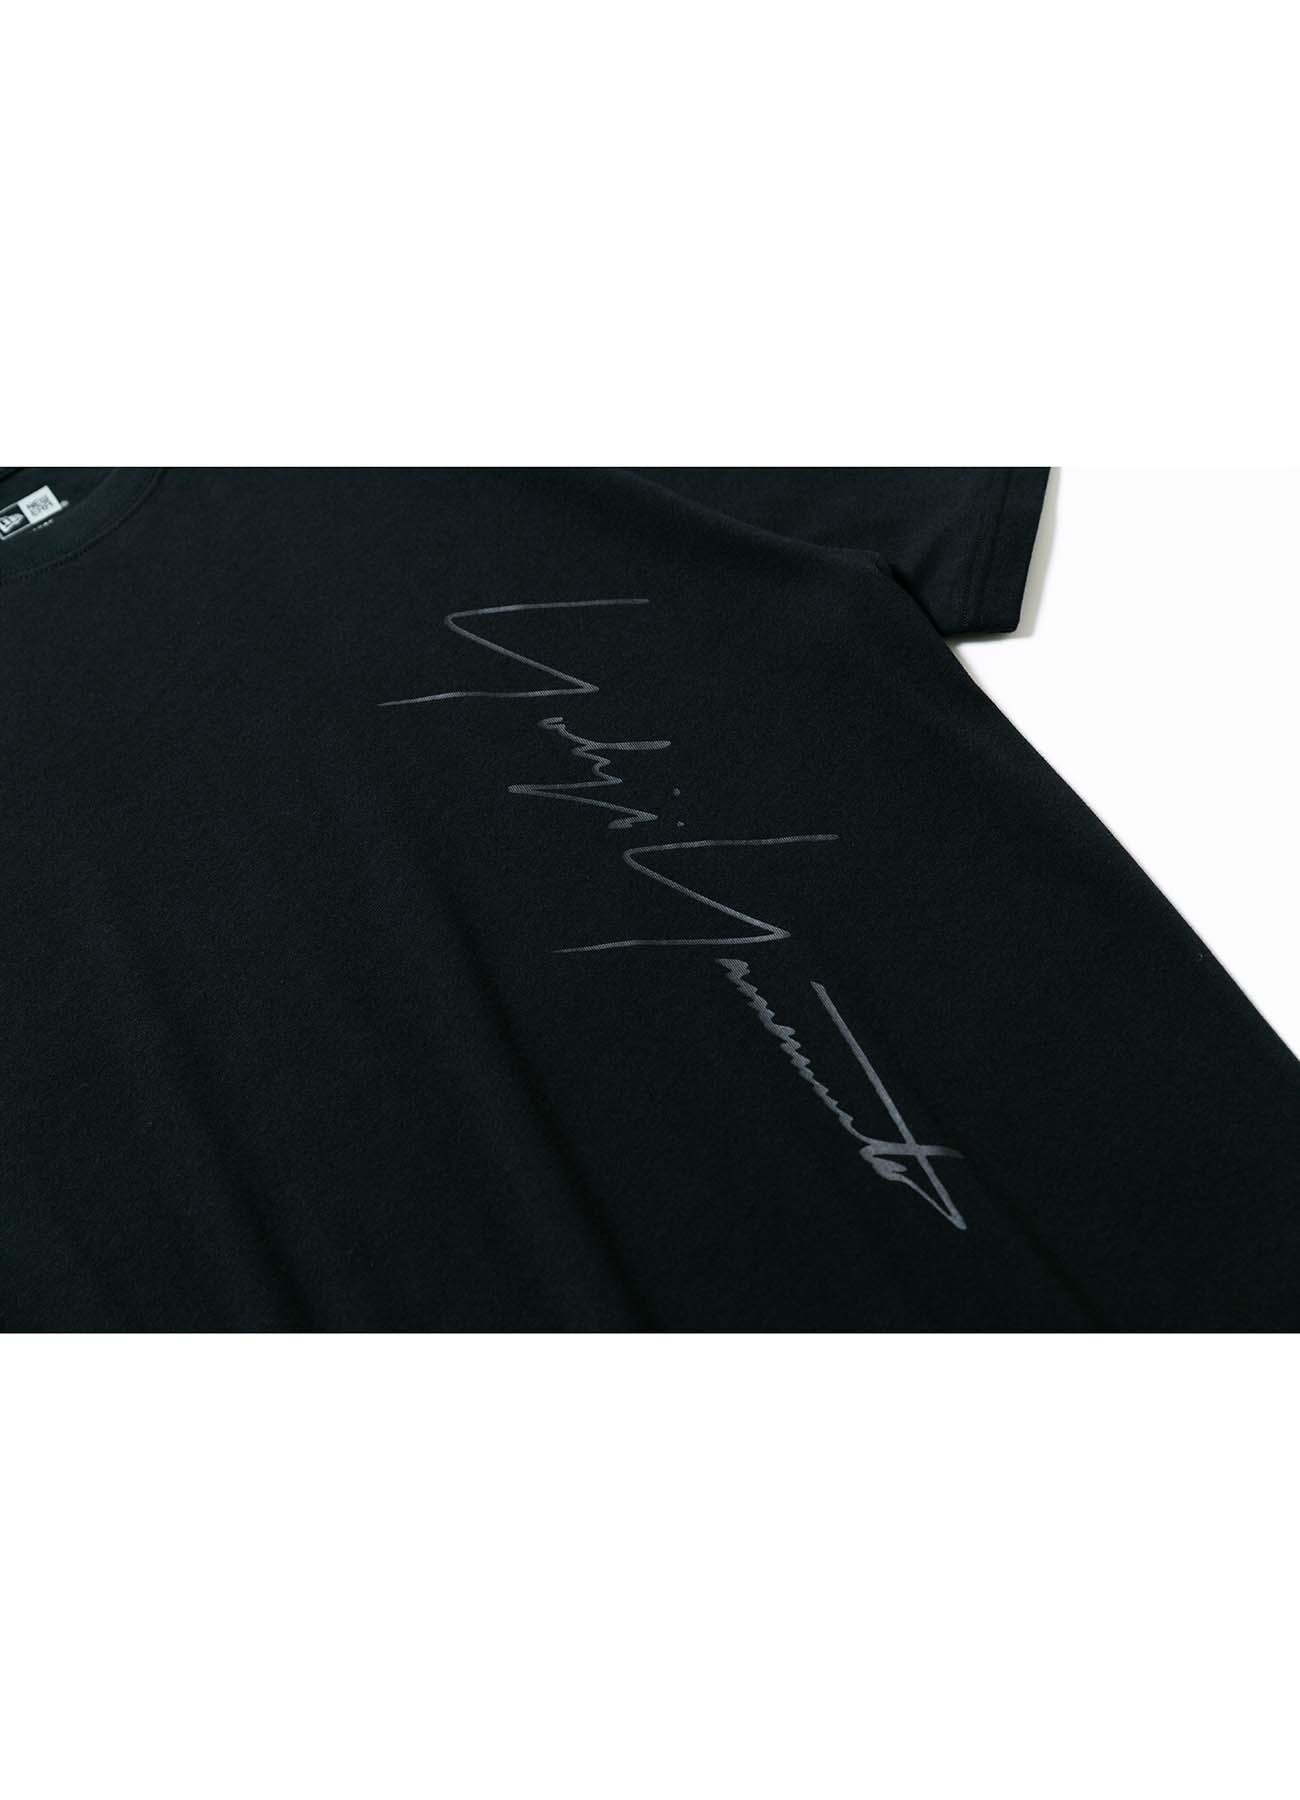 Yohji Yamamoto × New Era S/S YY PRINT COTTON TEE